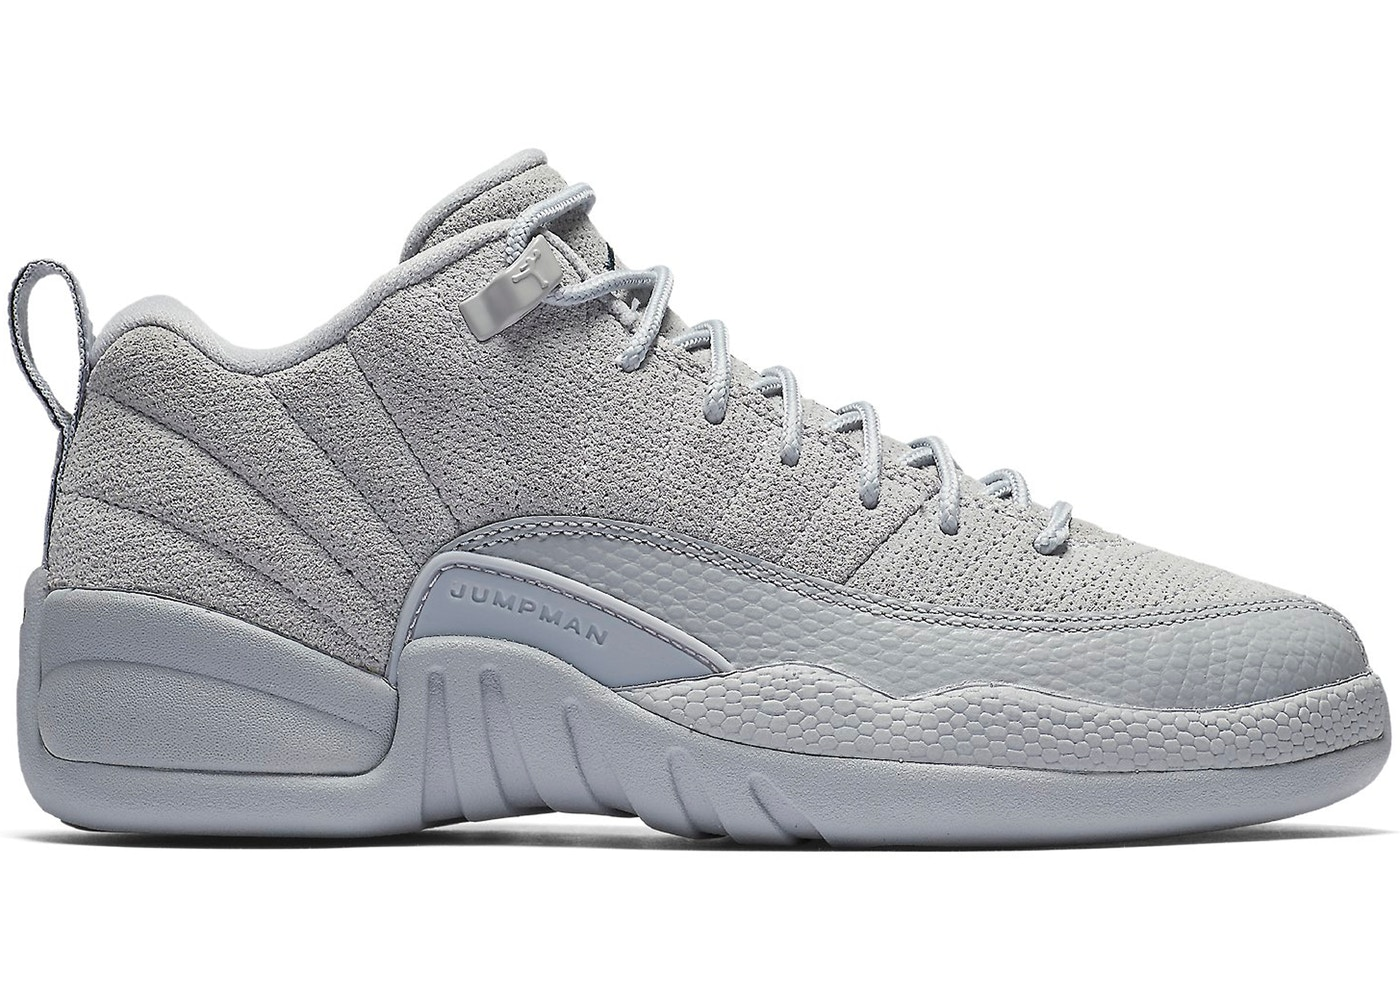 Jordan 12 Retro Low Wolf Grey (GS) - 308305-002 9c39b6acd